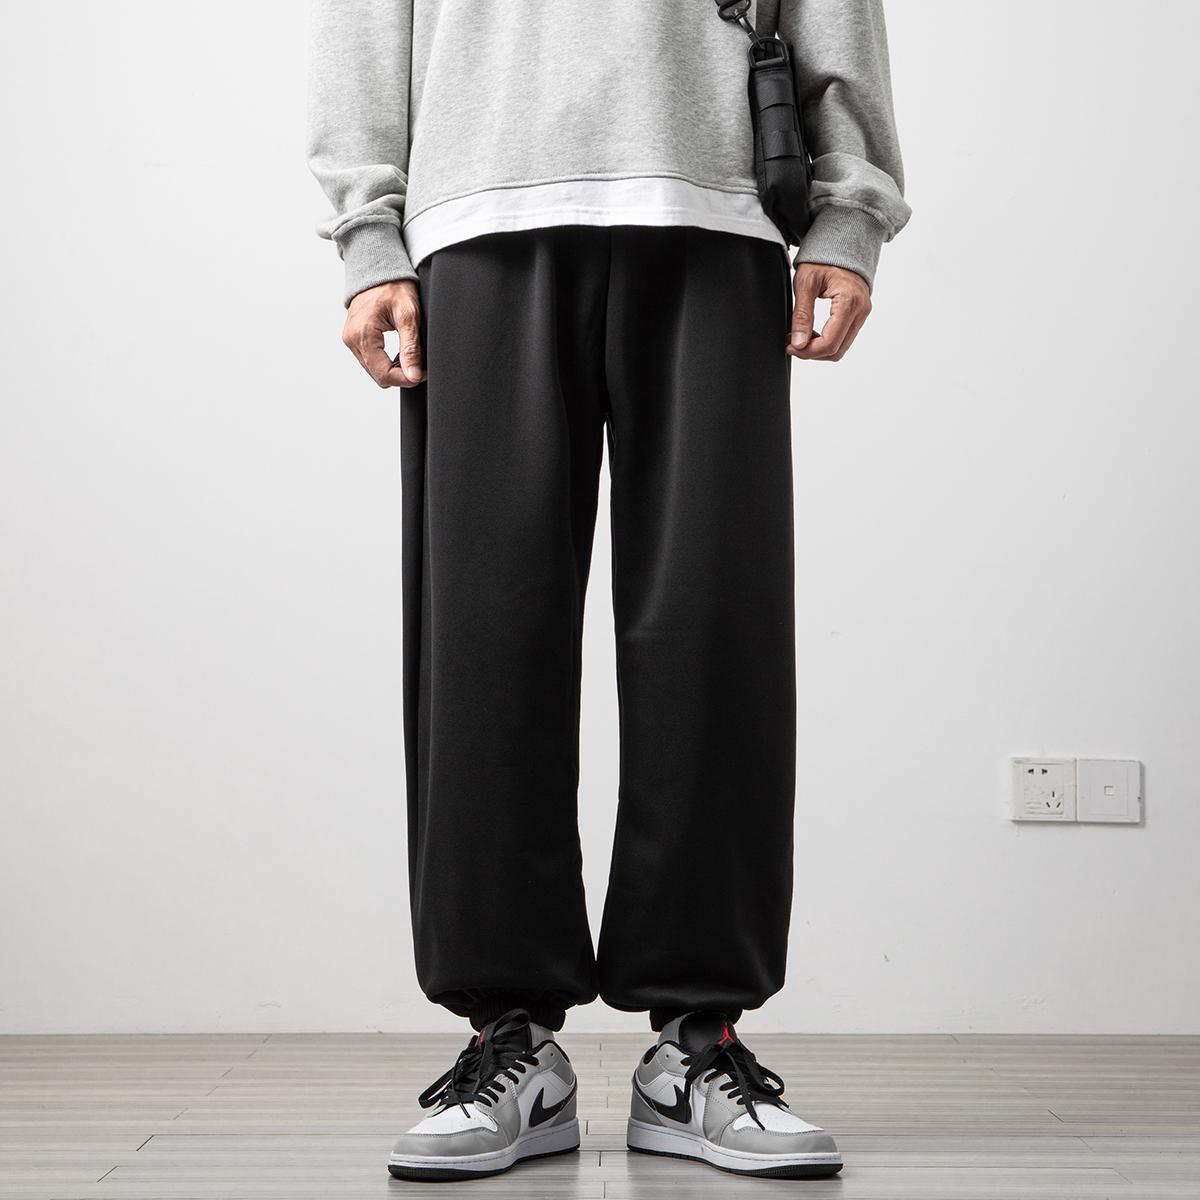 2021 new mens casual pants simple, loose and versatile fashion printed pant pants a110-k612-tp25